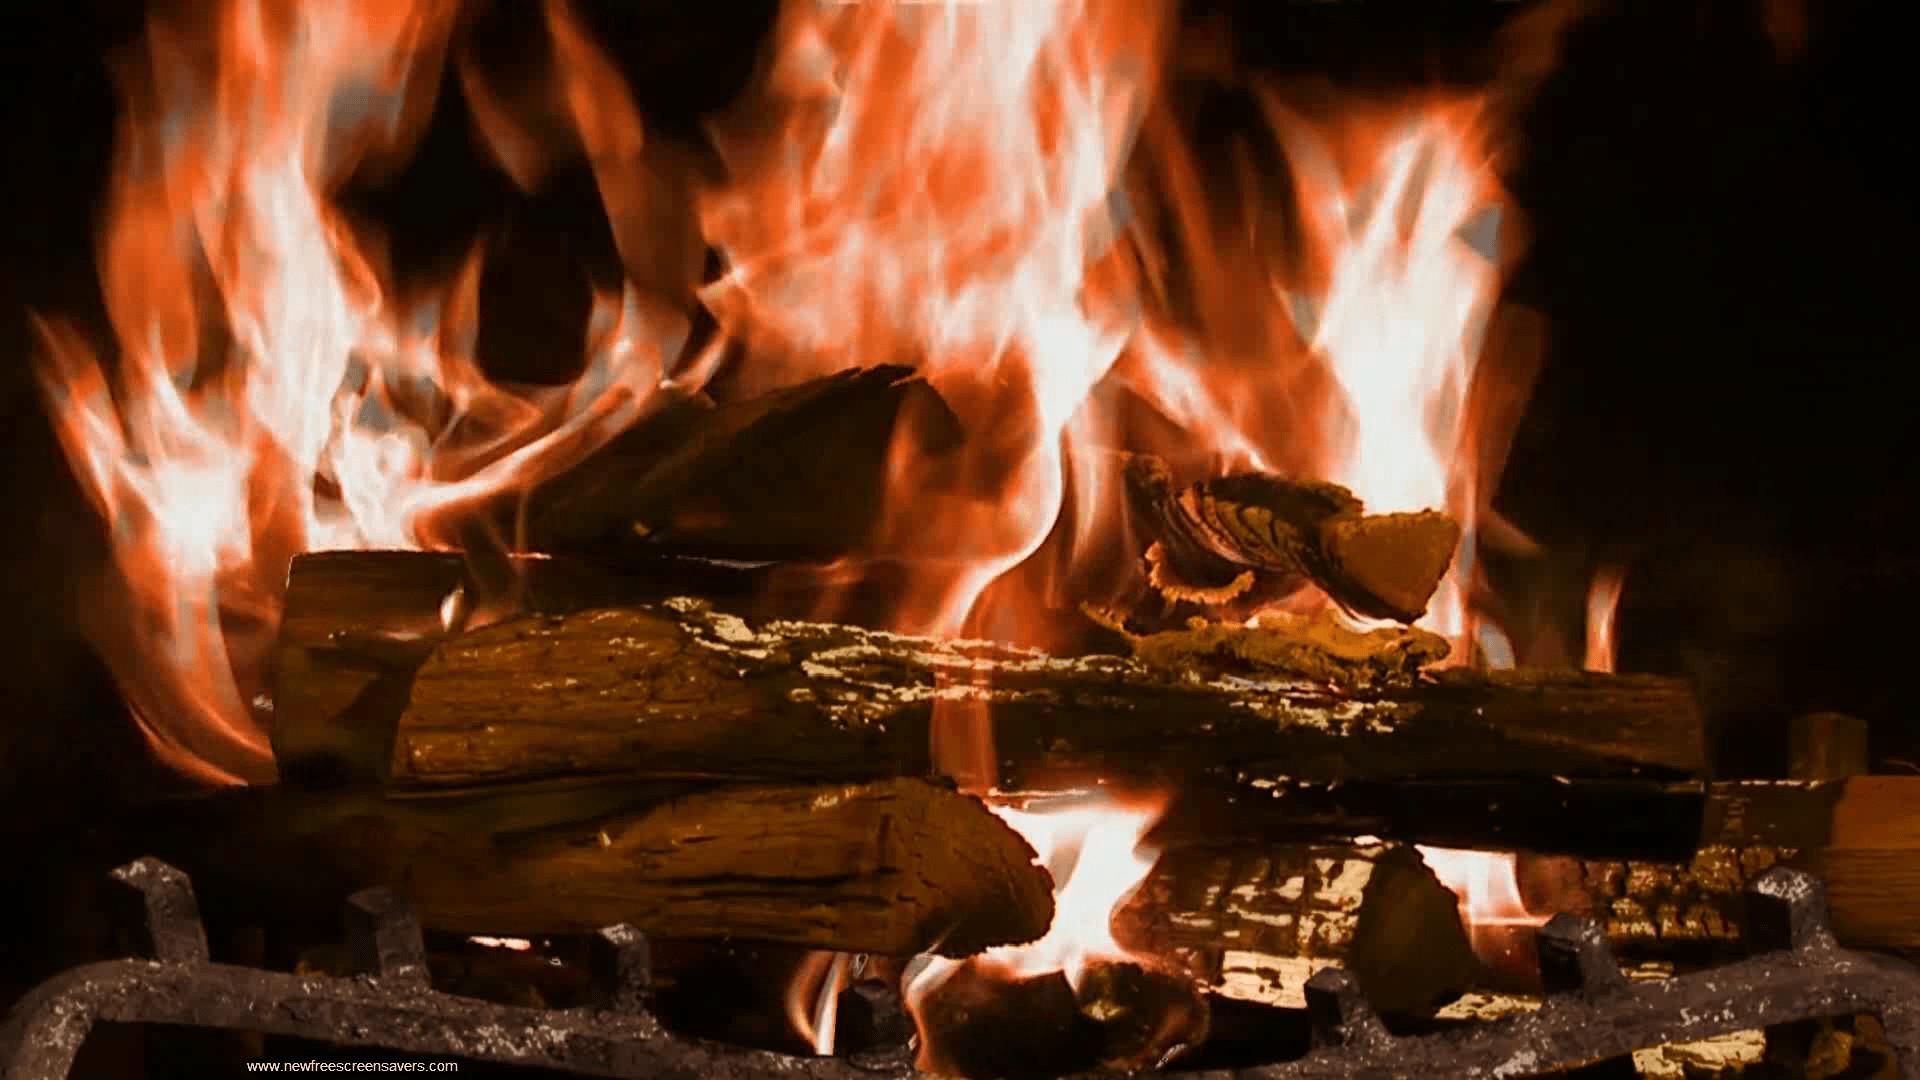 Fire Free Wallpaper Downloads: Fireplace Desktop Wallpaper ·①